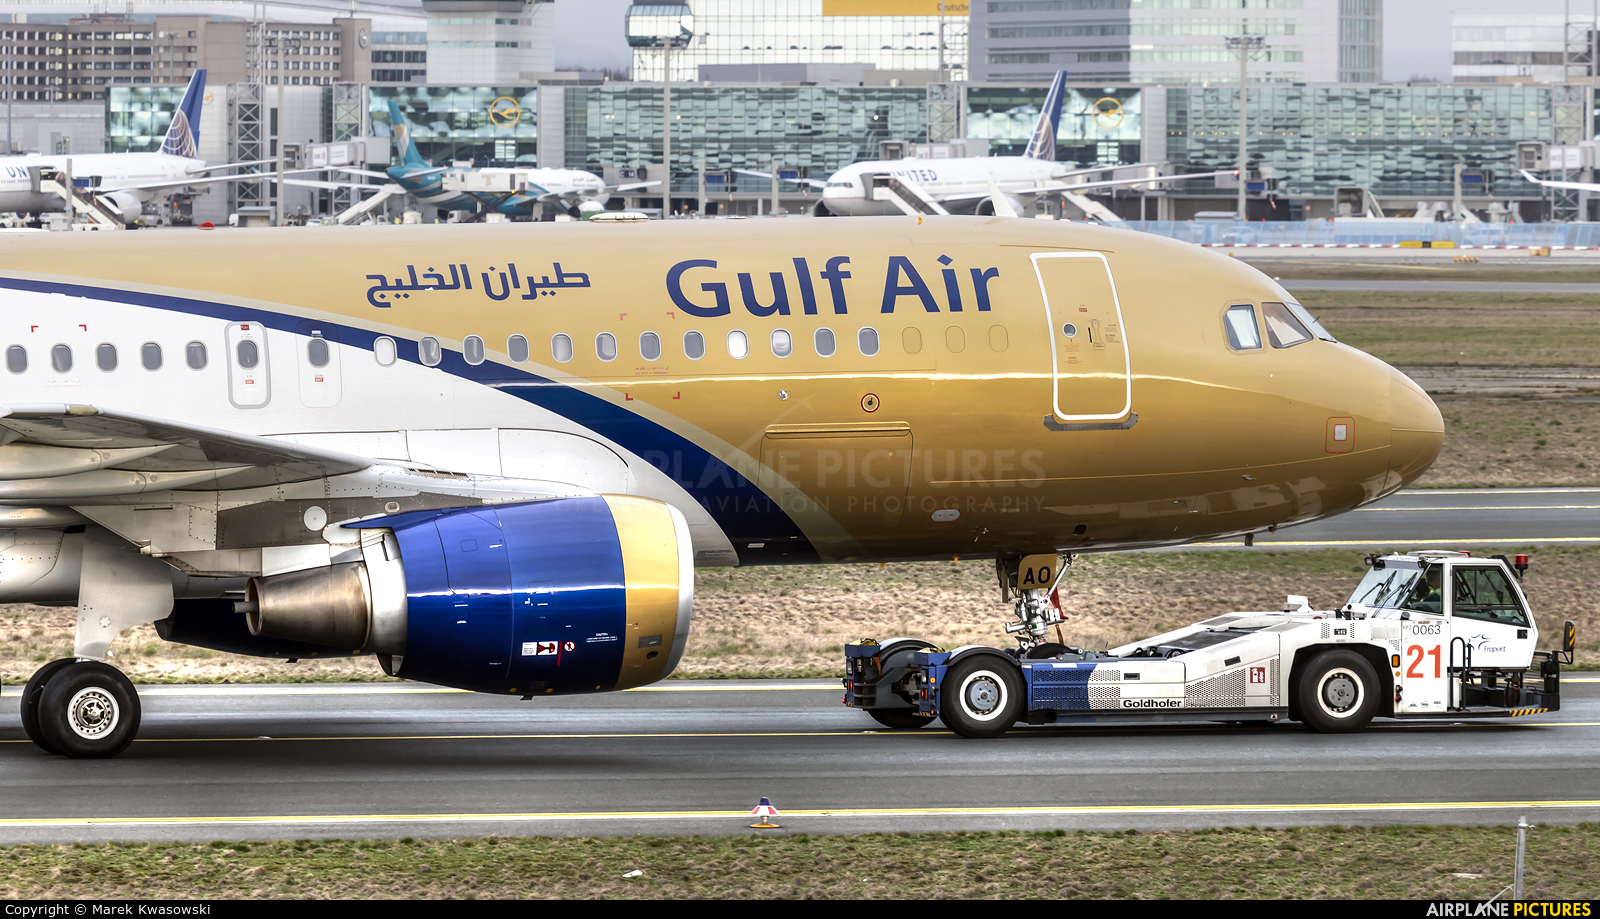 Gulf Air A9C-AO aircraft at Frankfurt